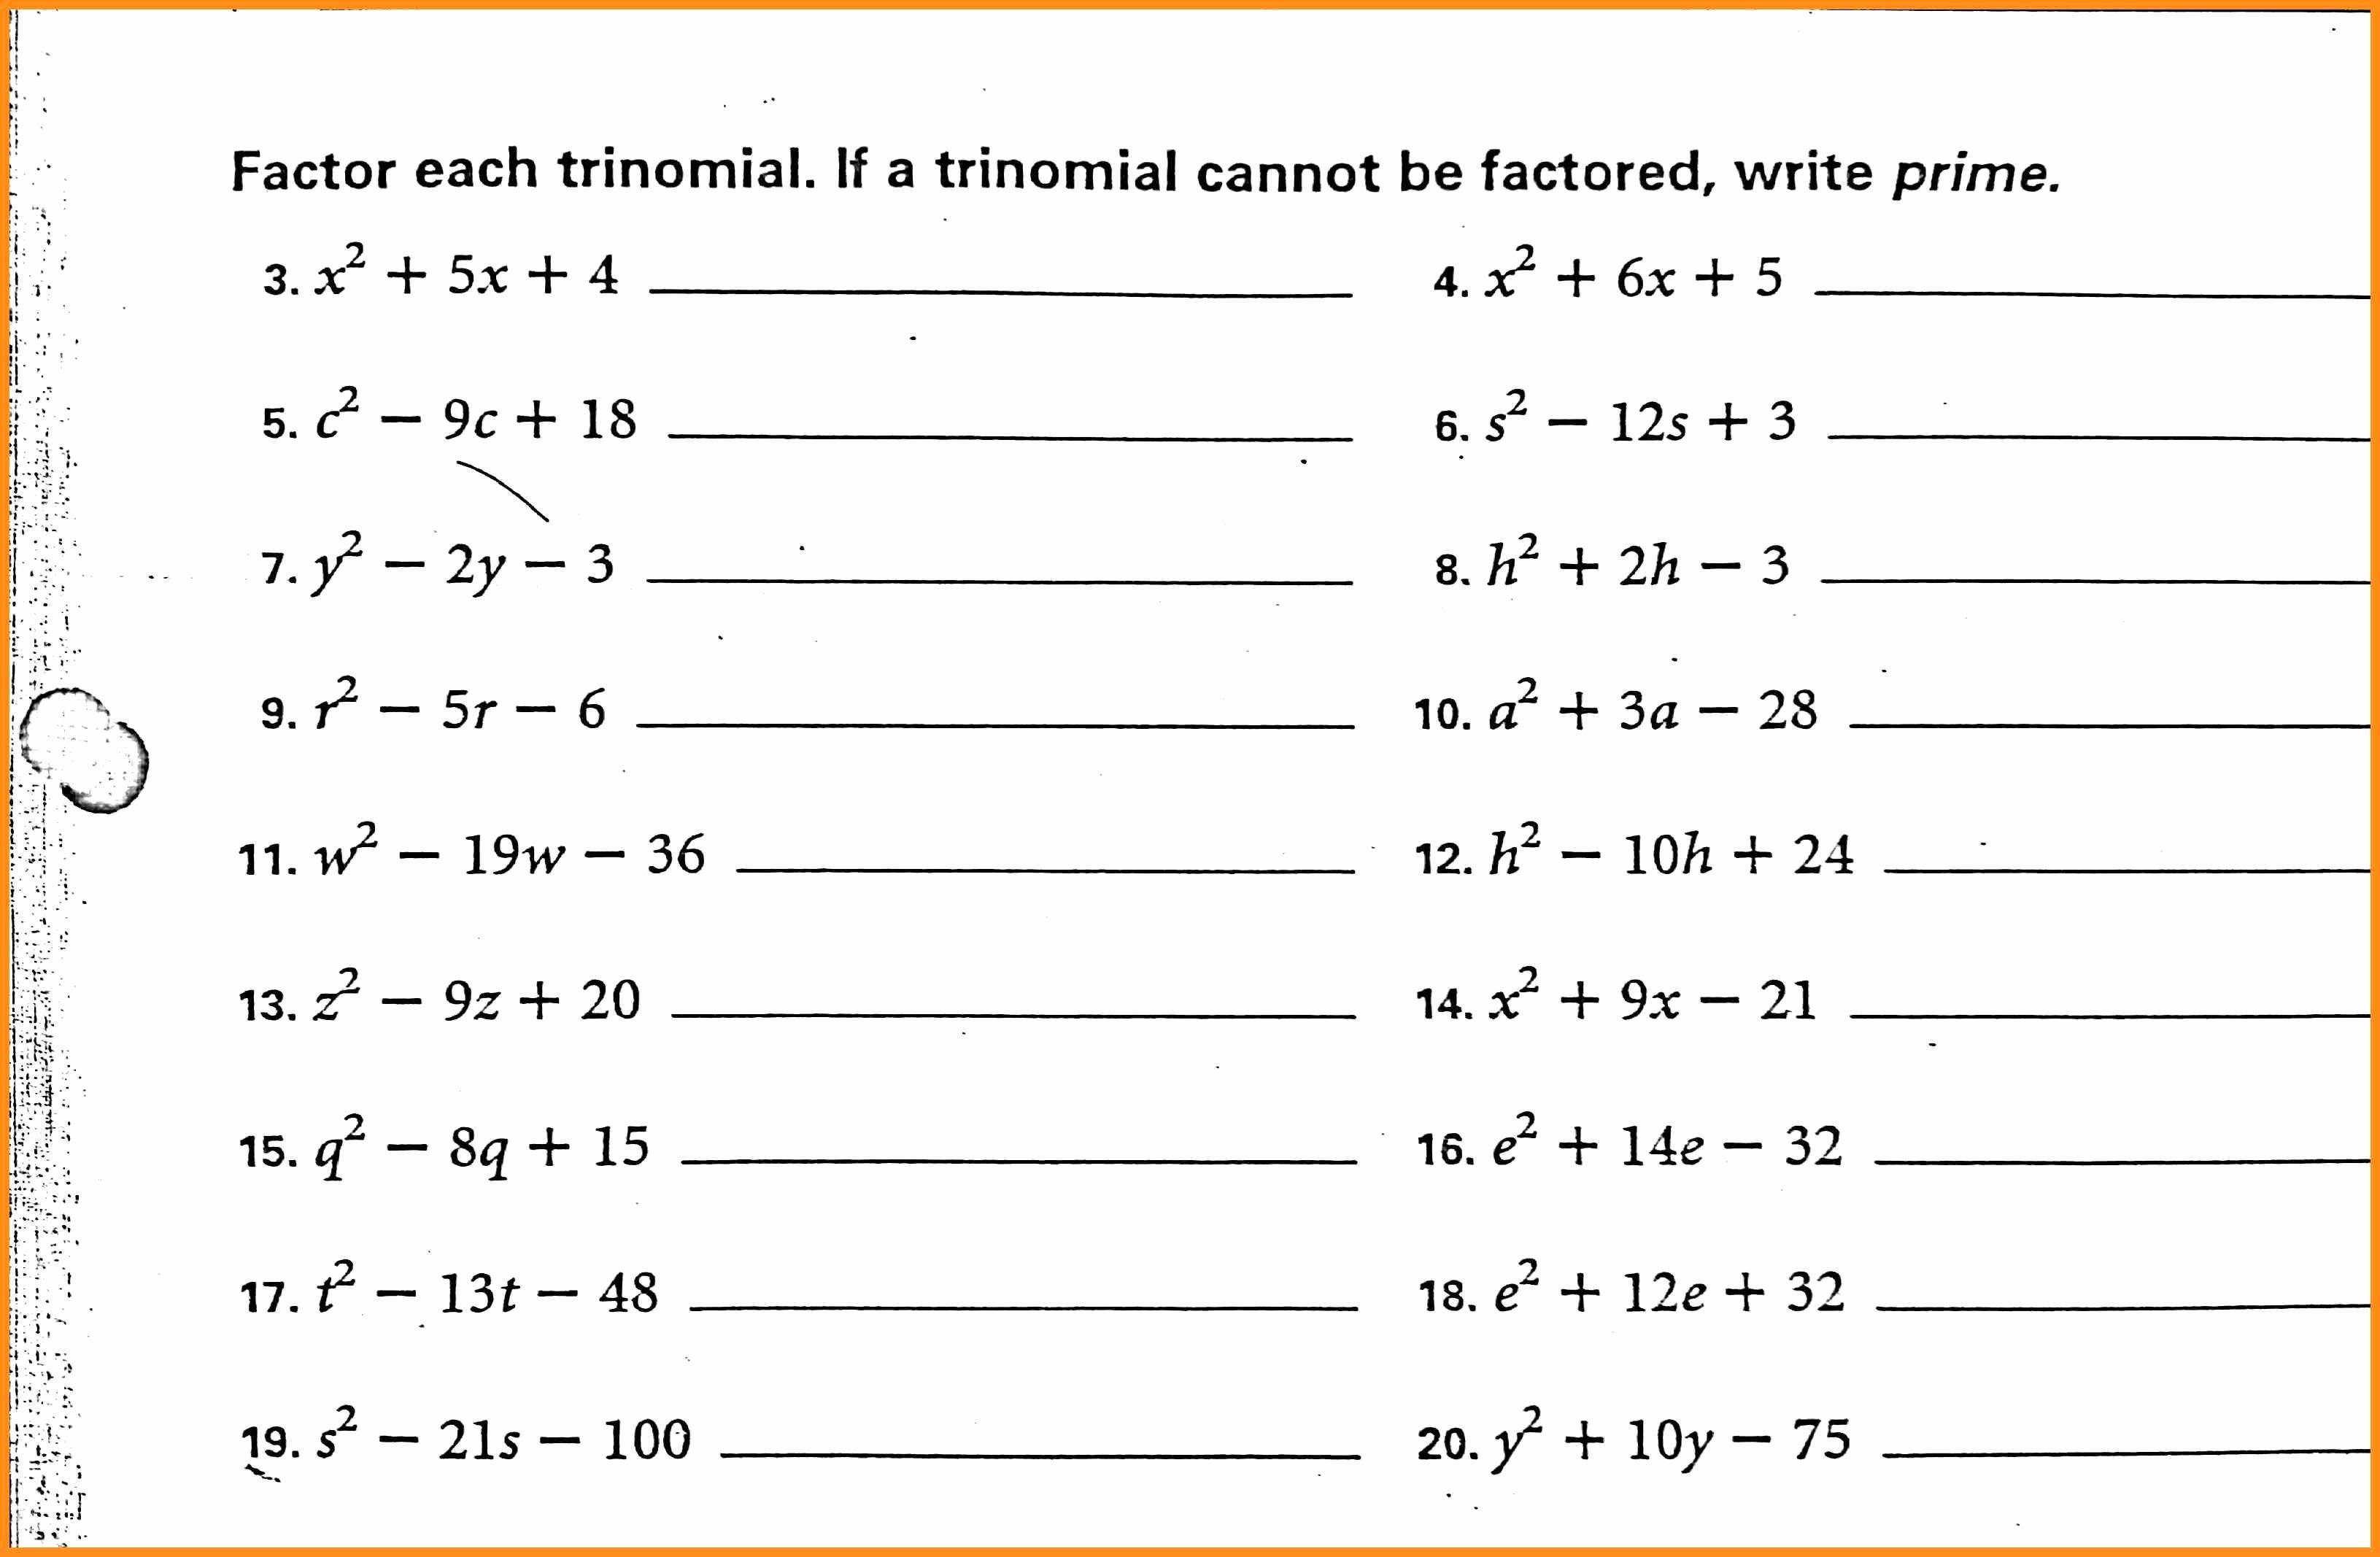 Factoring Trinomials Practice Worksheet Lovely 56 Factoring Polynomials Worksheet Pdf Factoring